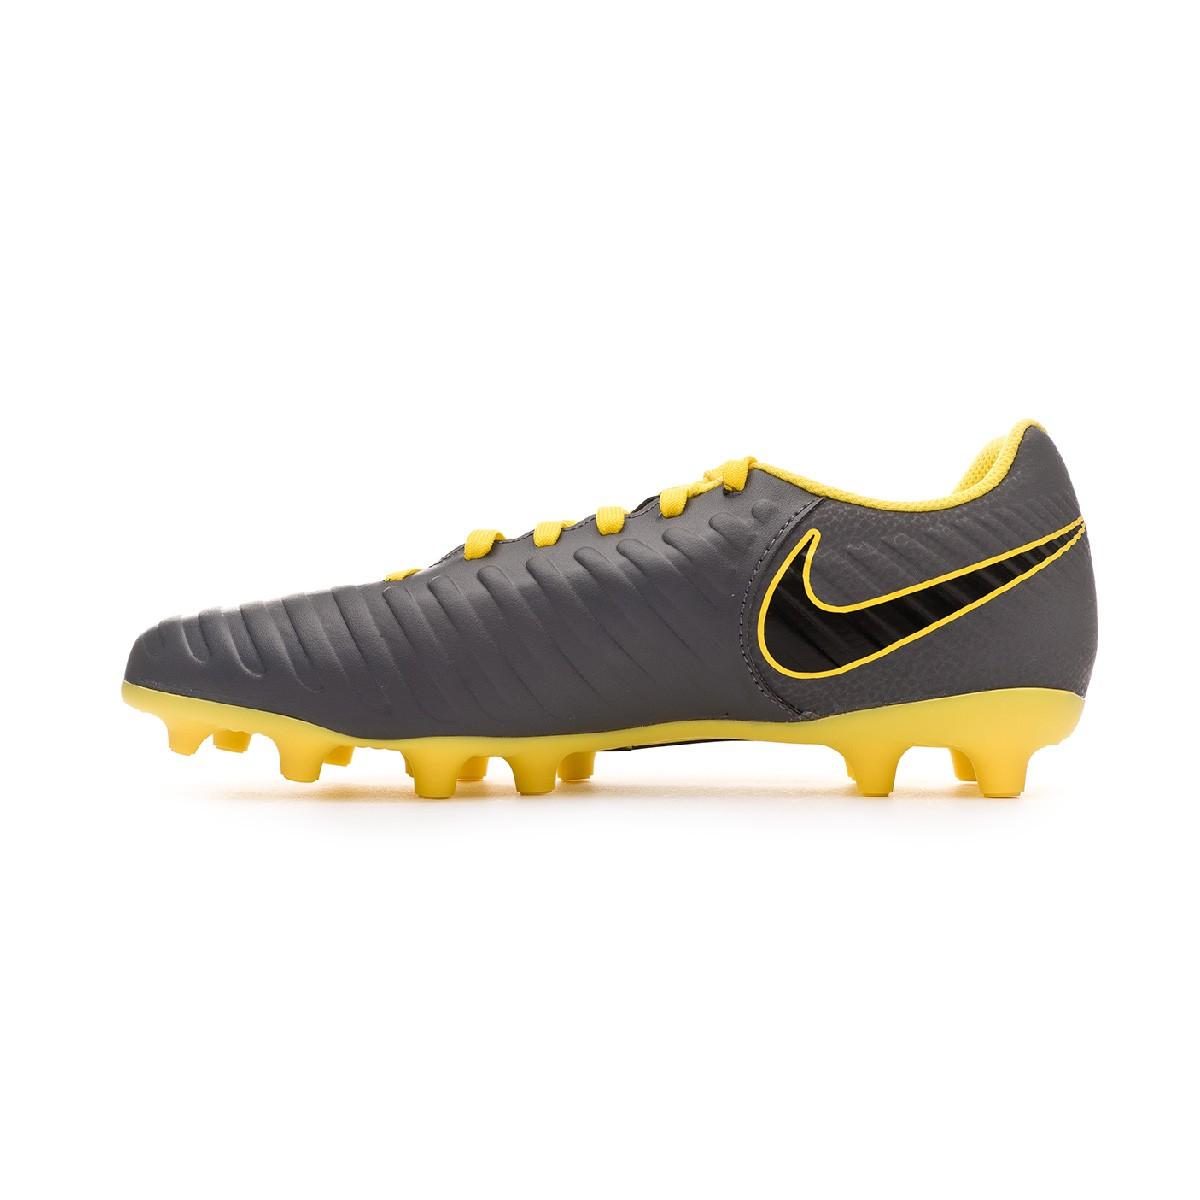 Nike Tiempo Legend Elite FG Cleats Dark Grey Yellow